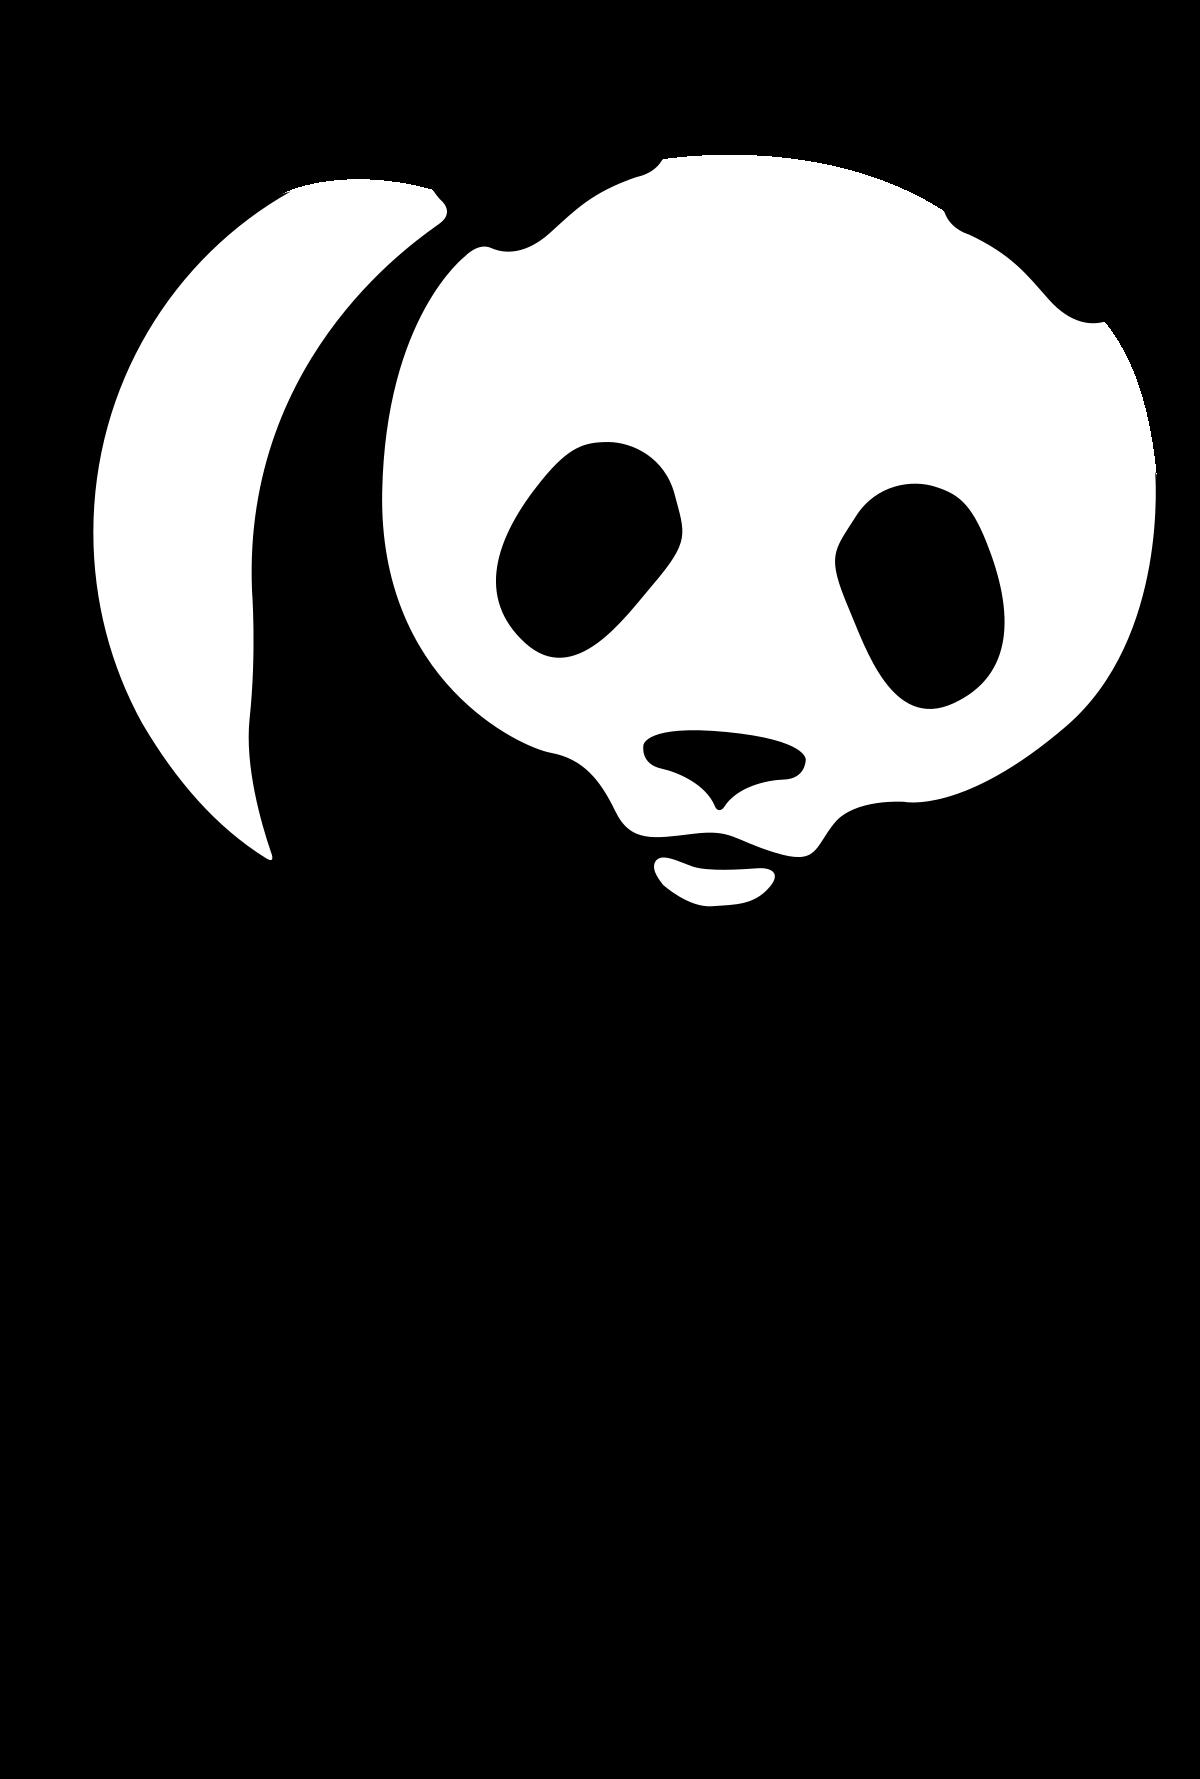 WWF image